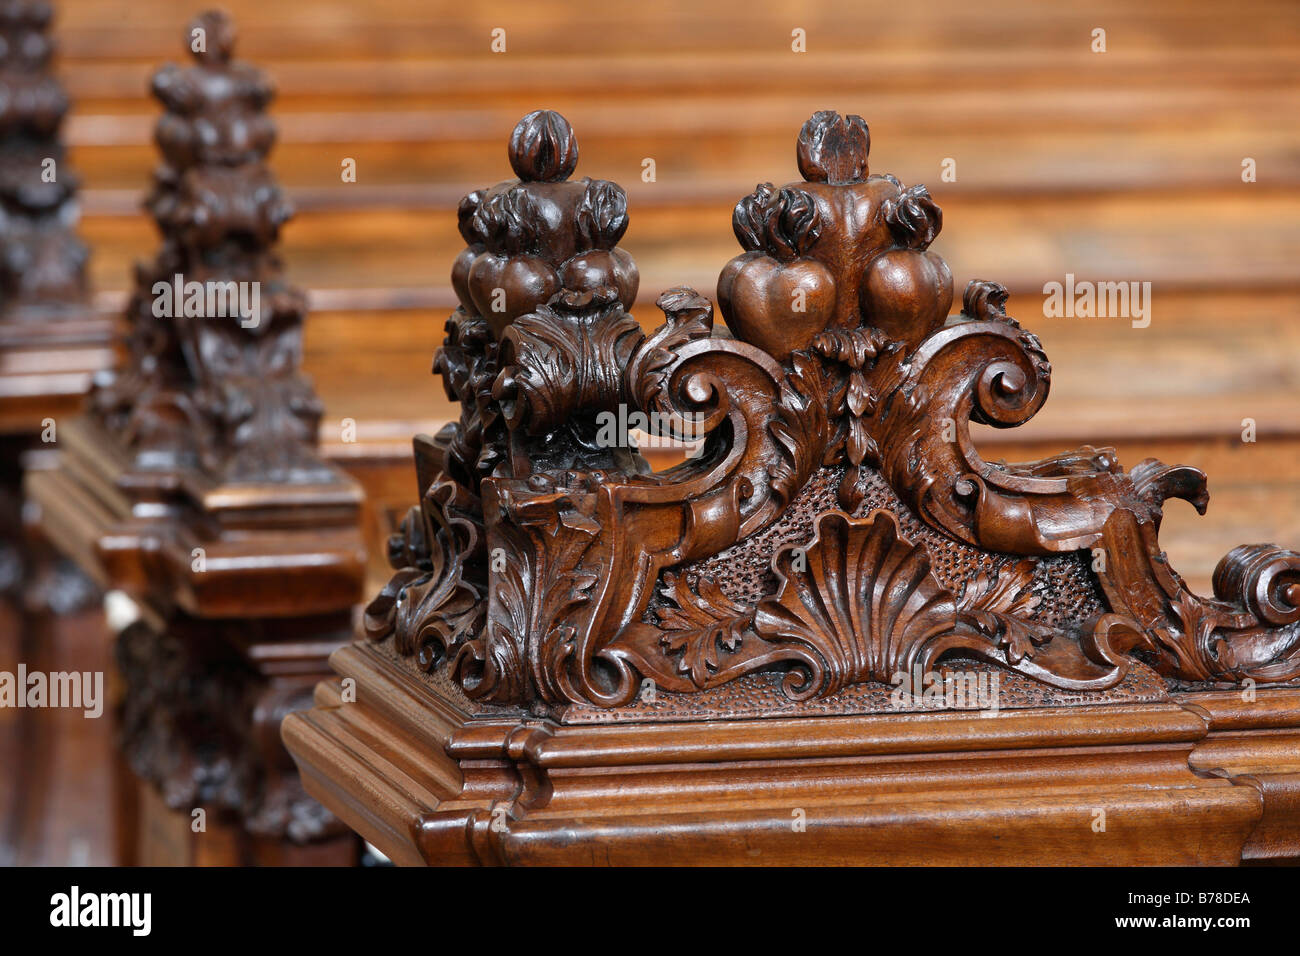 Carved detail on a church pew, Jesuitenkirche, Jesuit Church, city, Vienna, Austria, Europe - Stock Image